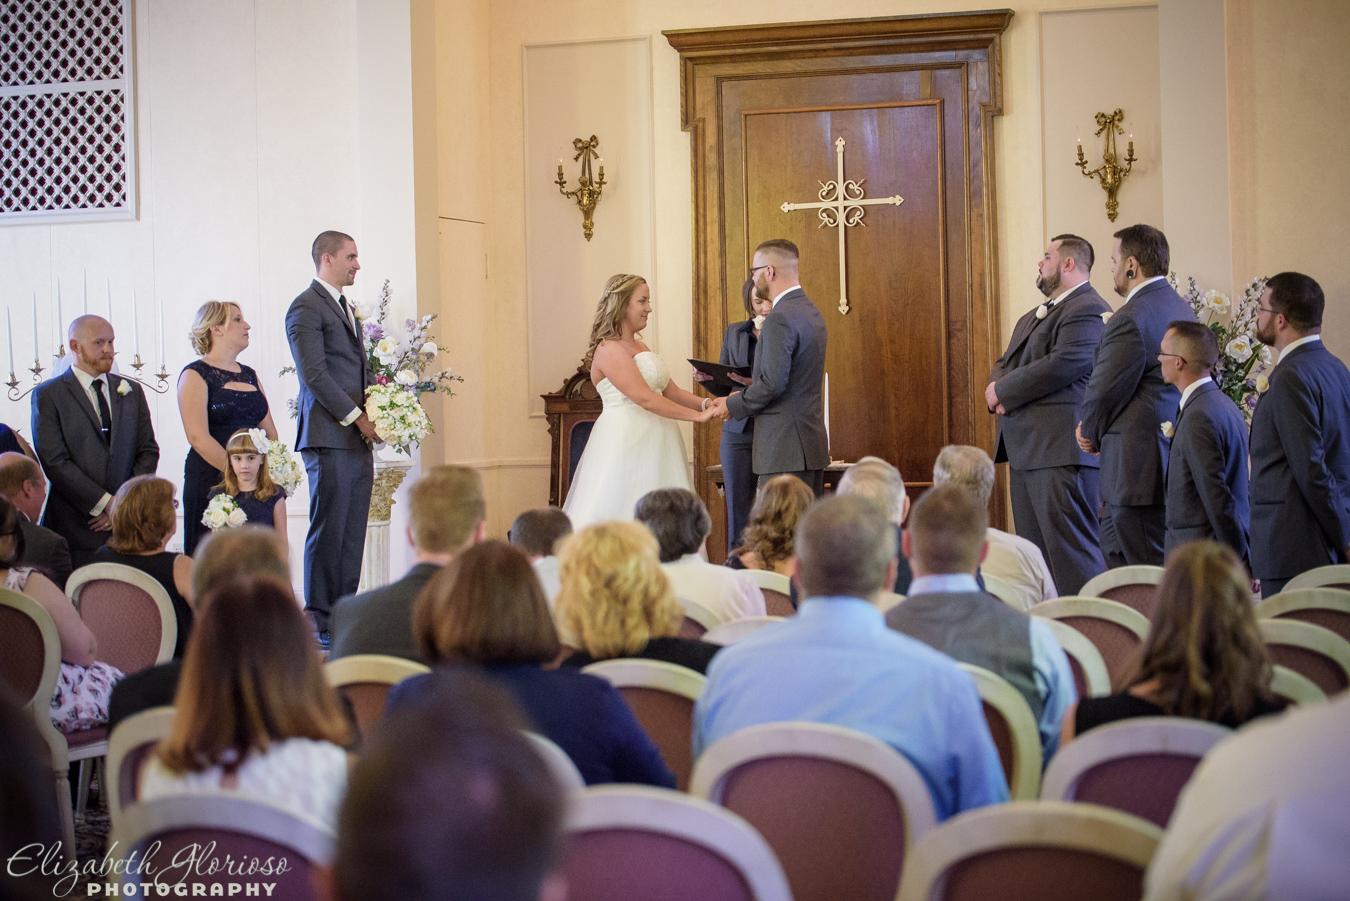 Zakovec_Wedding_Glorioso_Photography_Cleveland-119